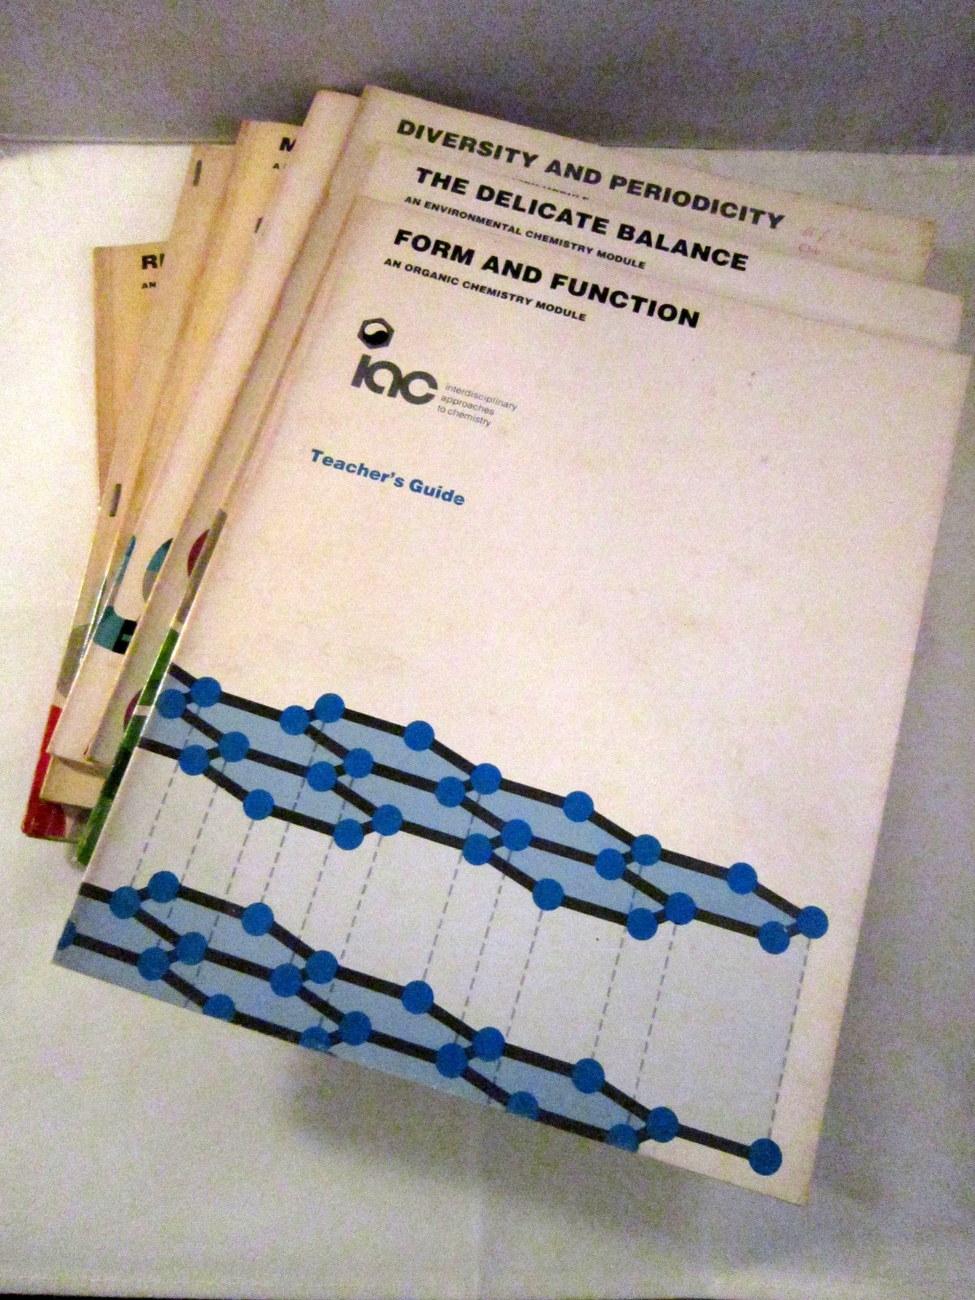 Chemistry iac modules 1970s teacher guide 01a